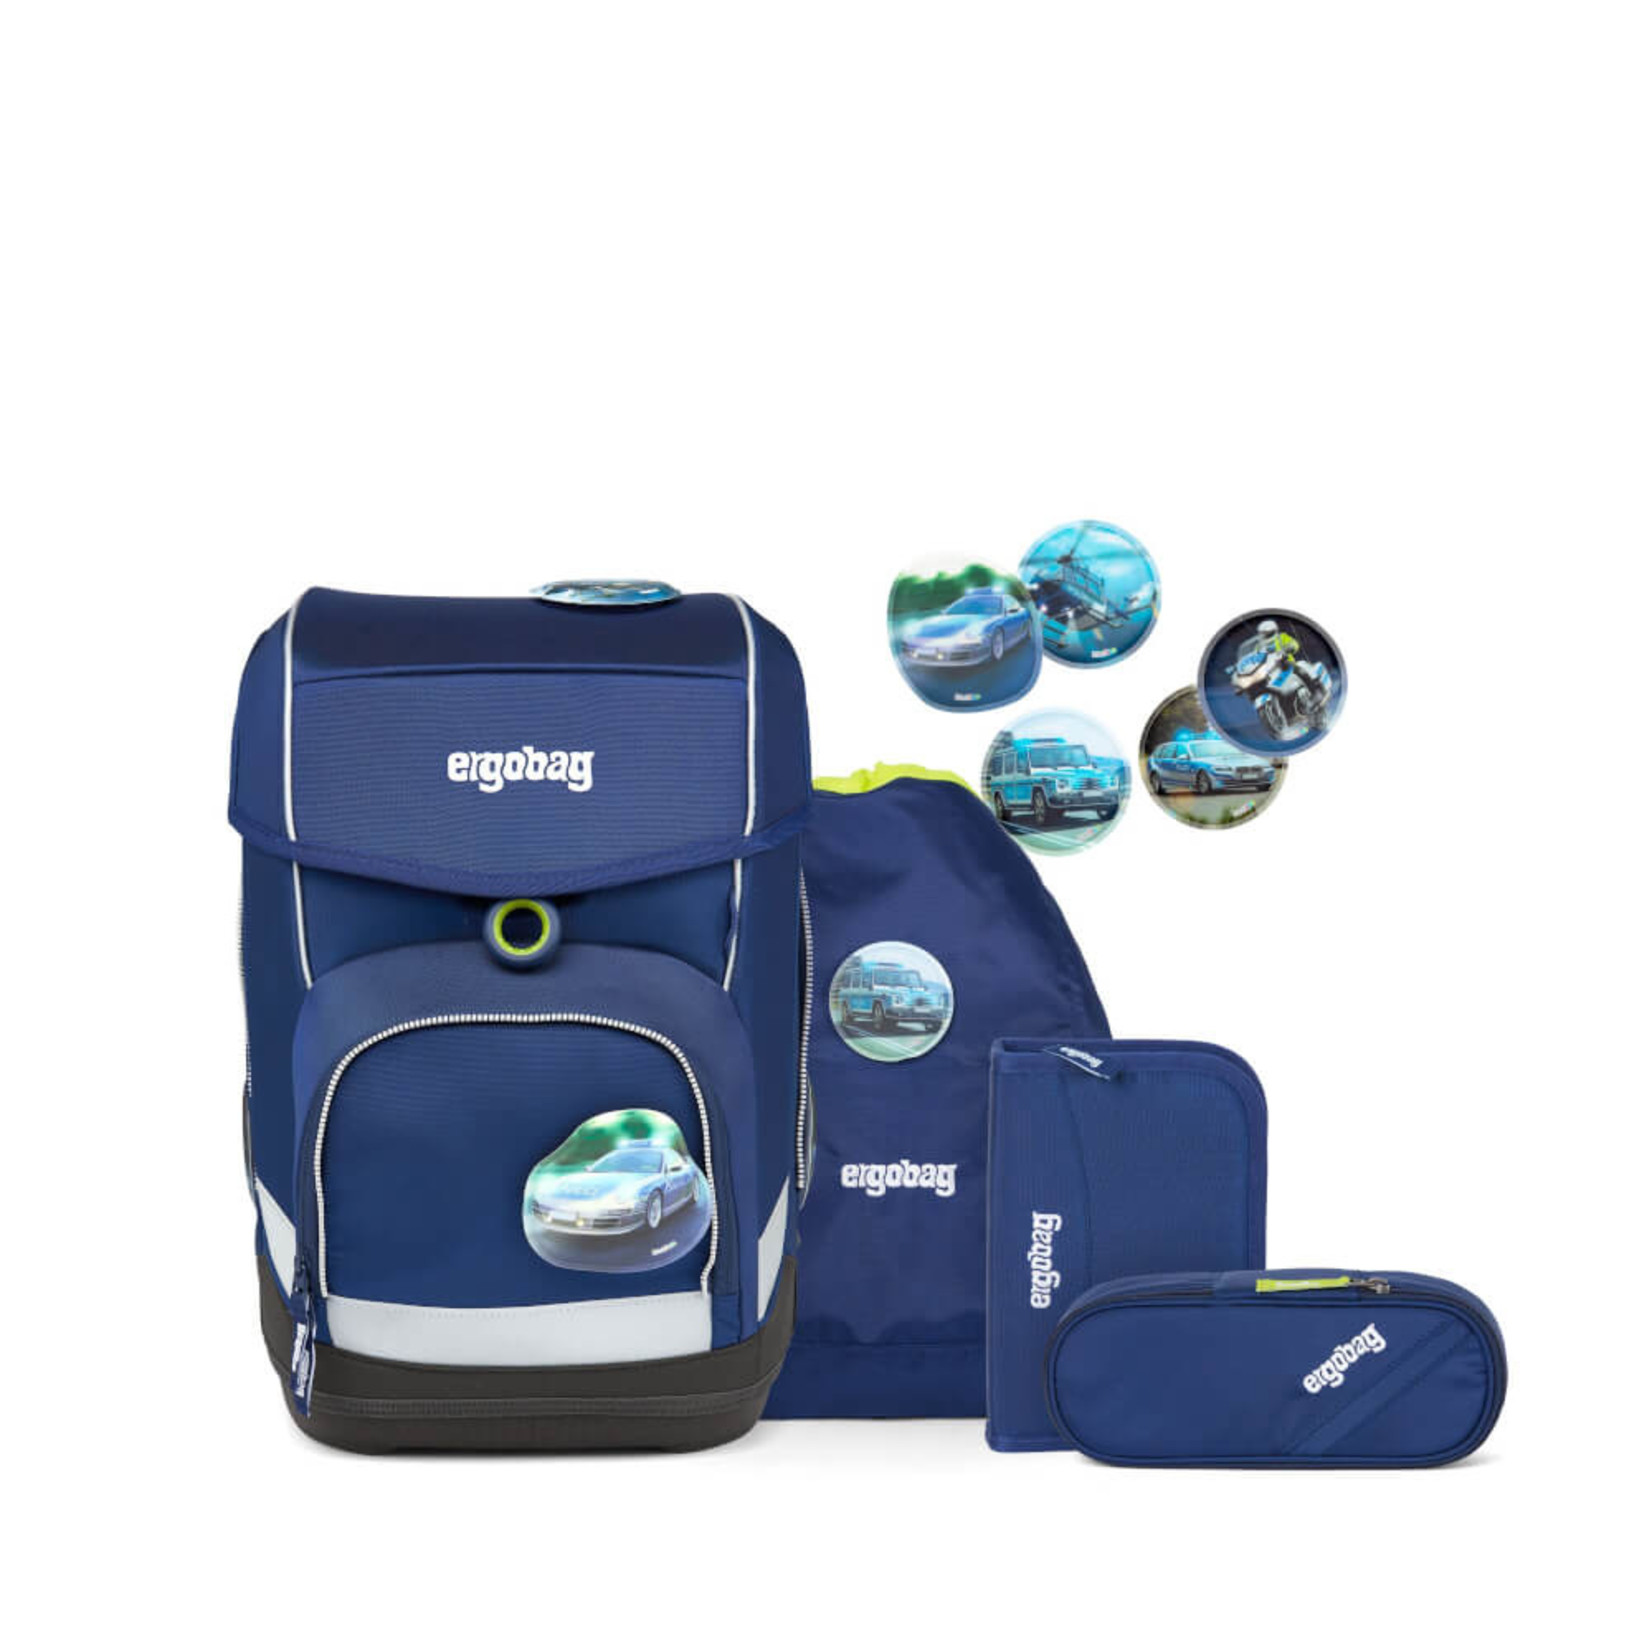 ERGOBAG ergobag cubo Schulranzen-Set BlaulichtBär